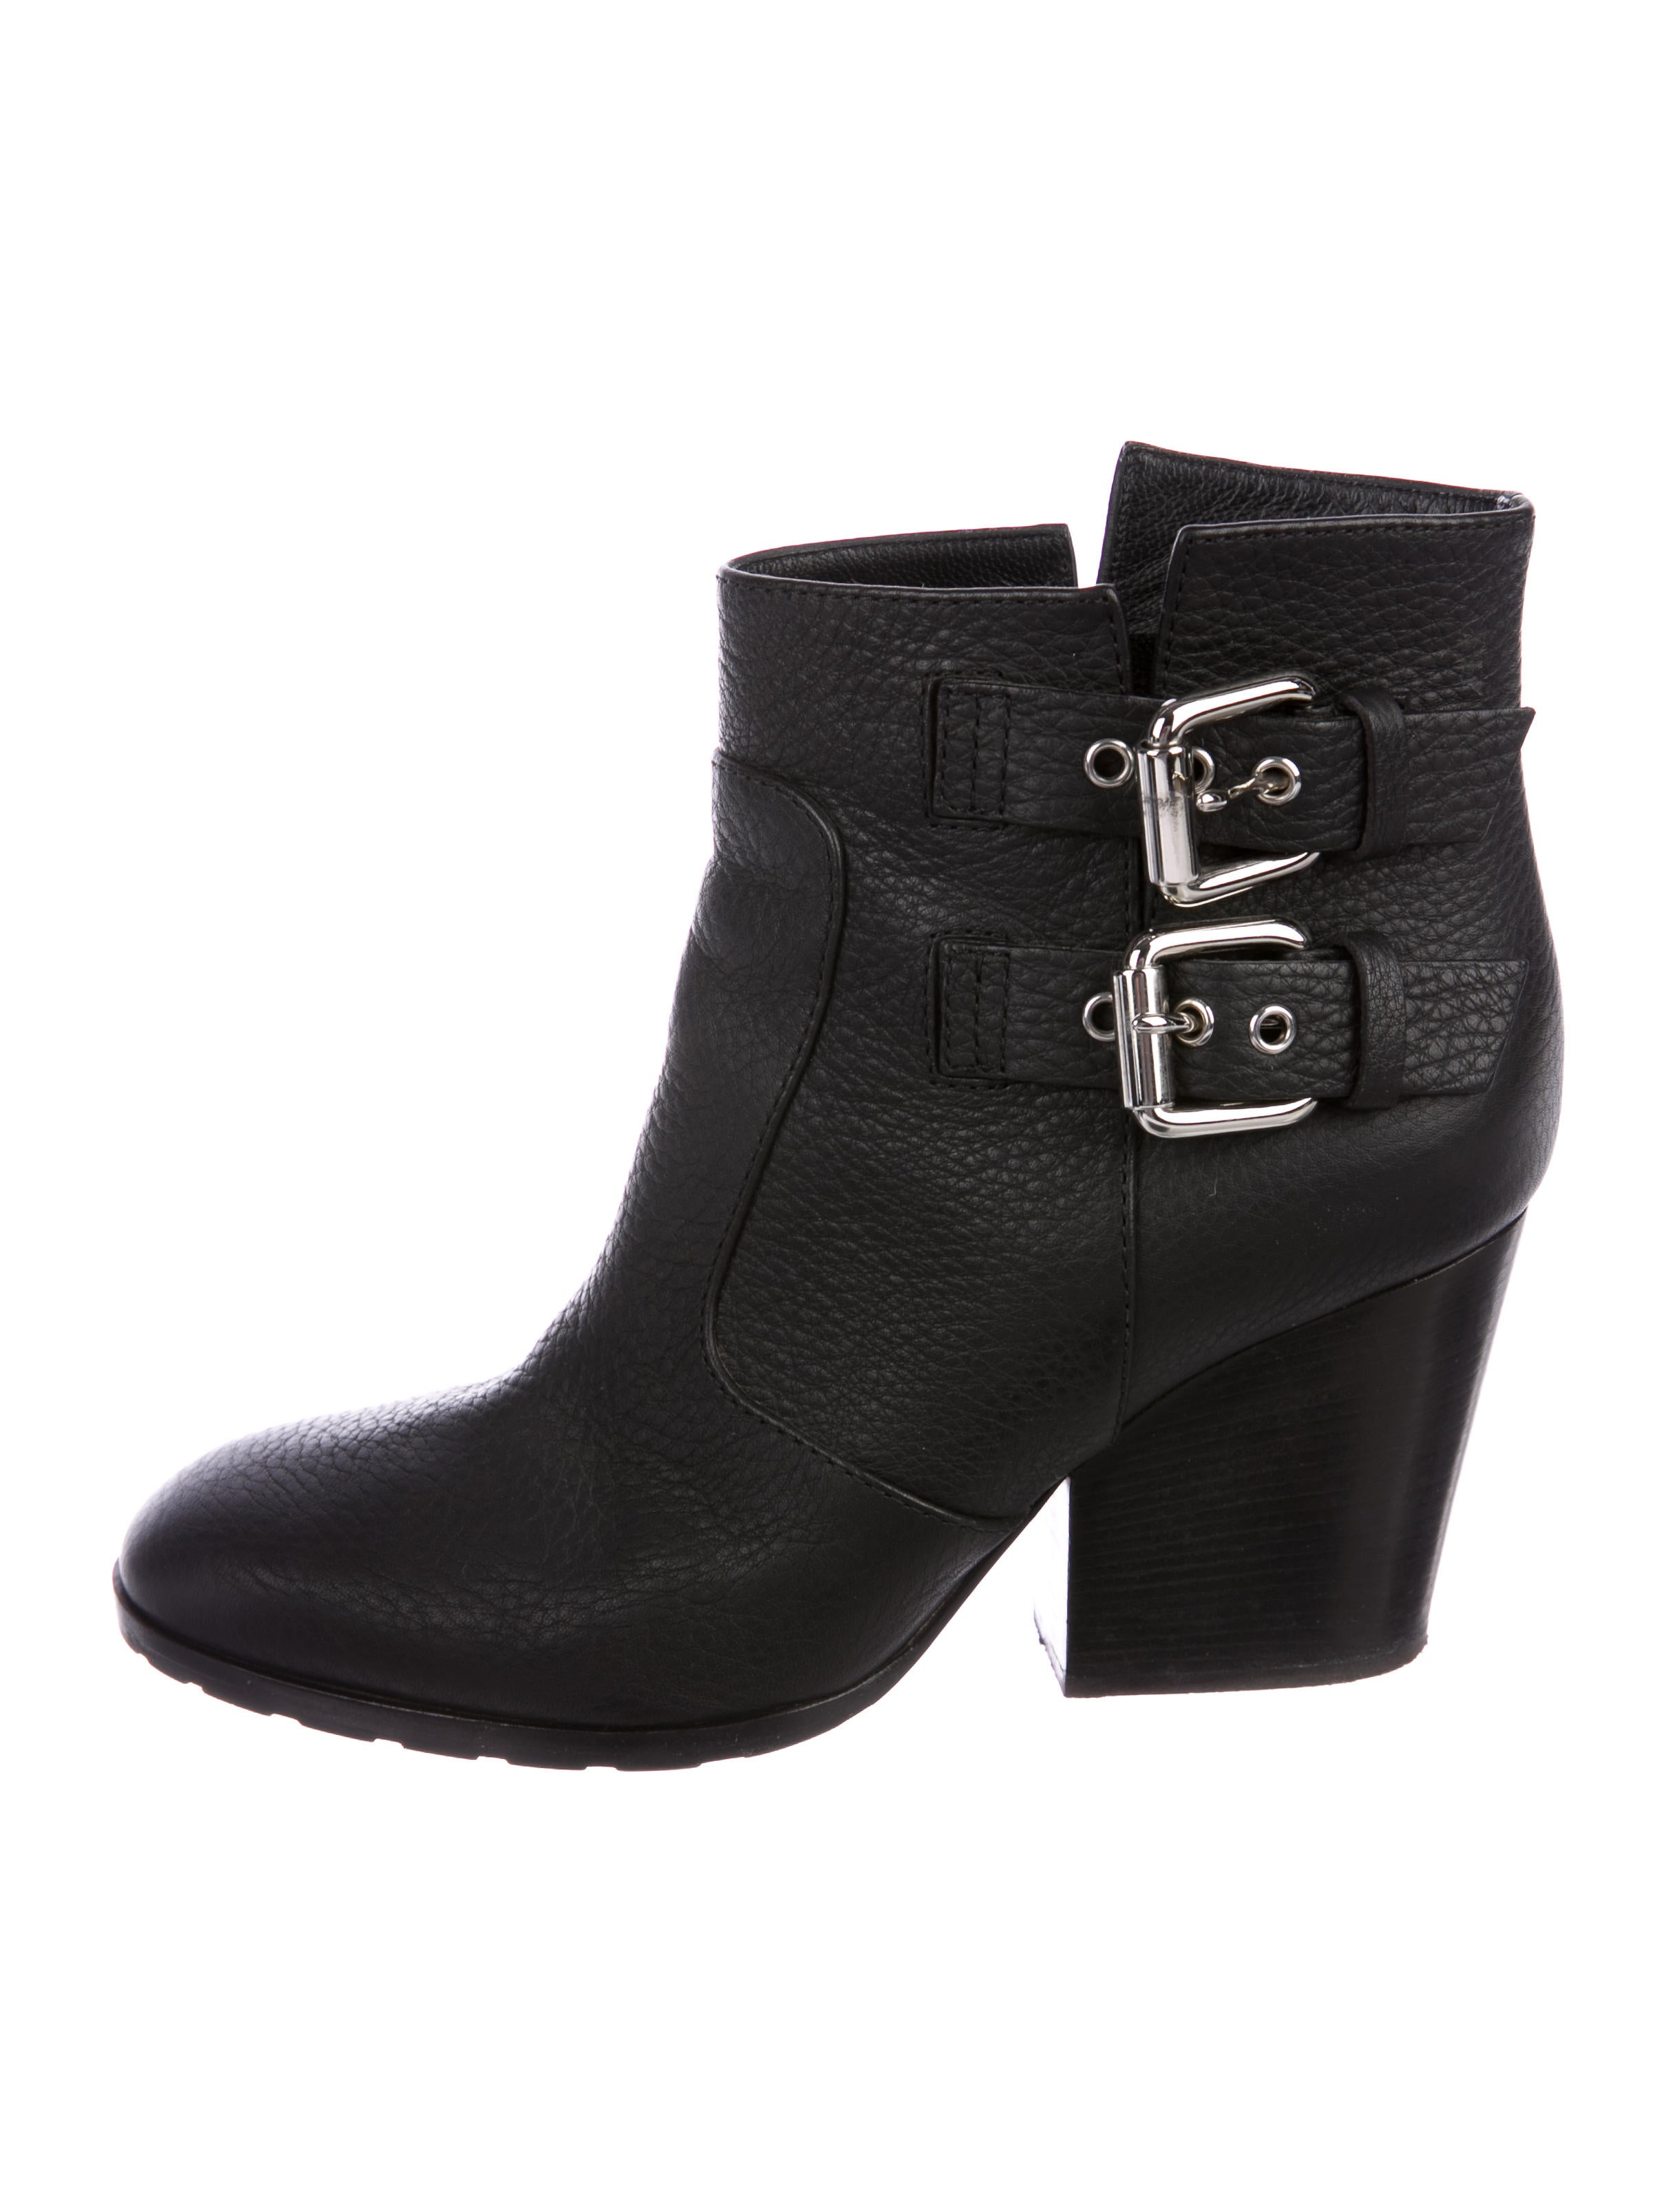 Women · Shoes; Giuseppe Zanotti Leather Buckle-Embellished Ankle Boots. Leather  Buckle-Embellished Ankle Boots